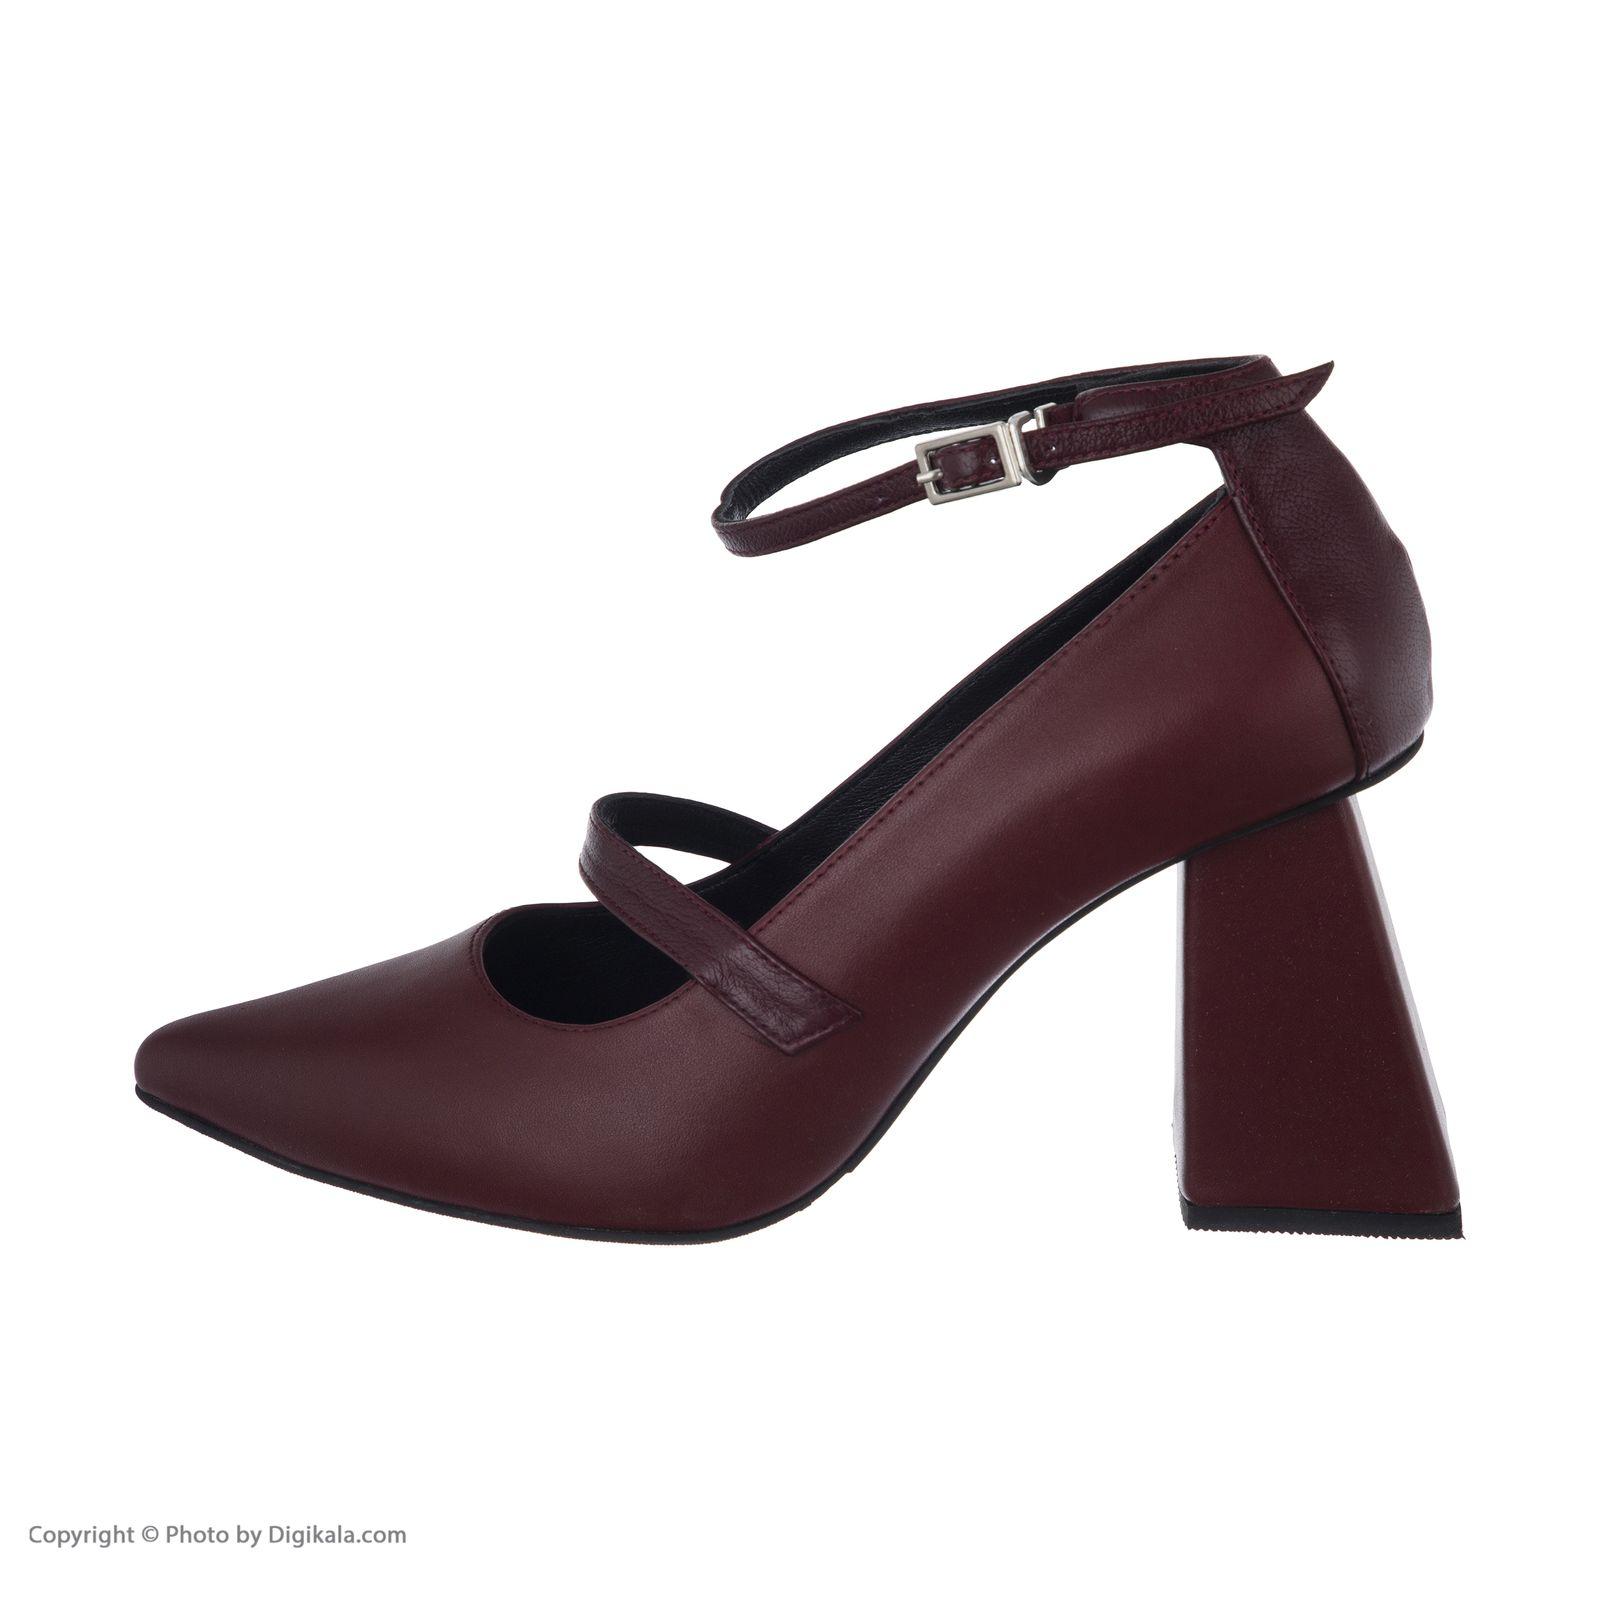 کفش زنانه آرتمن مدل Merry-41176 -  - 3